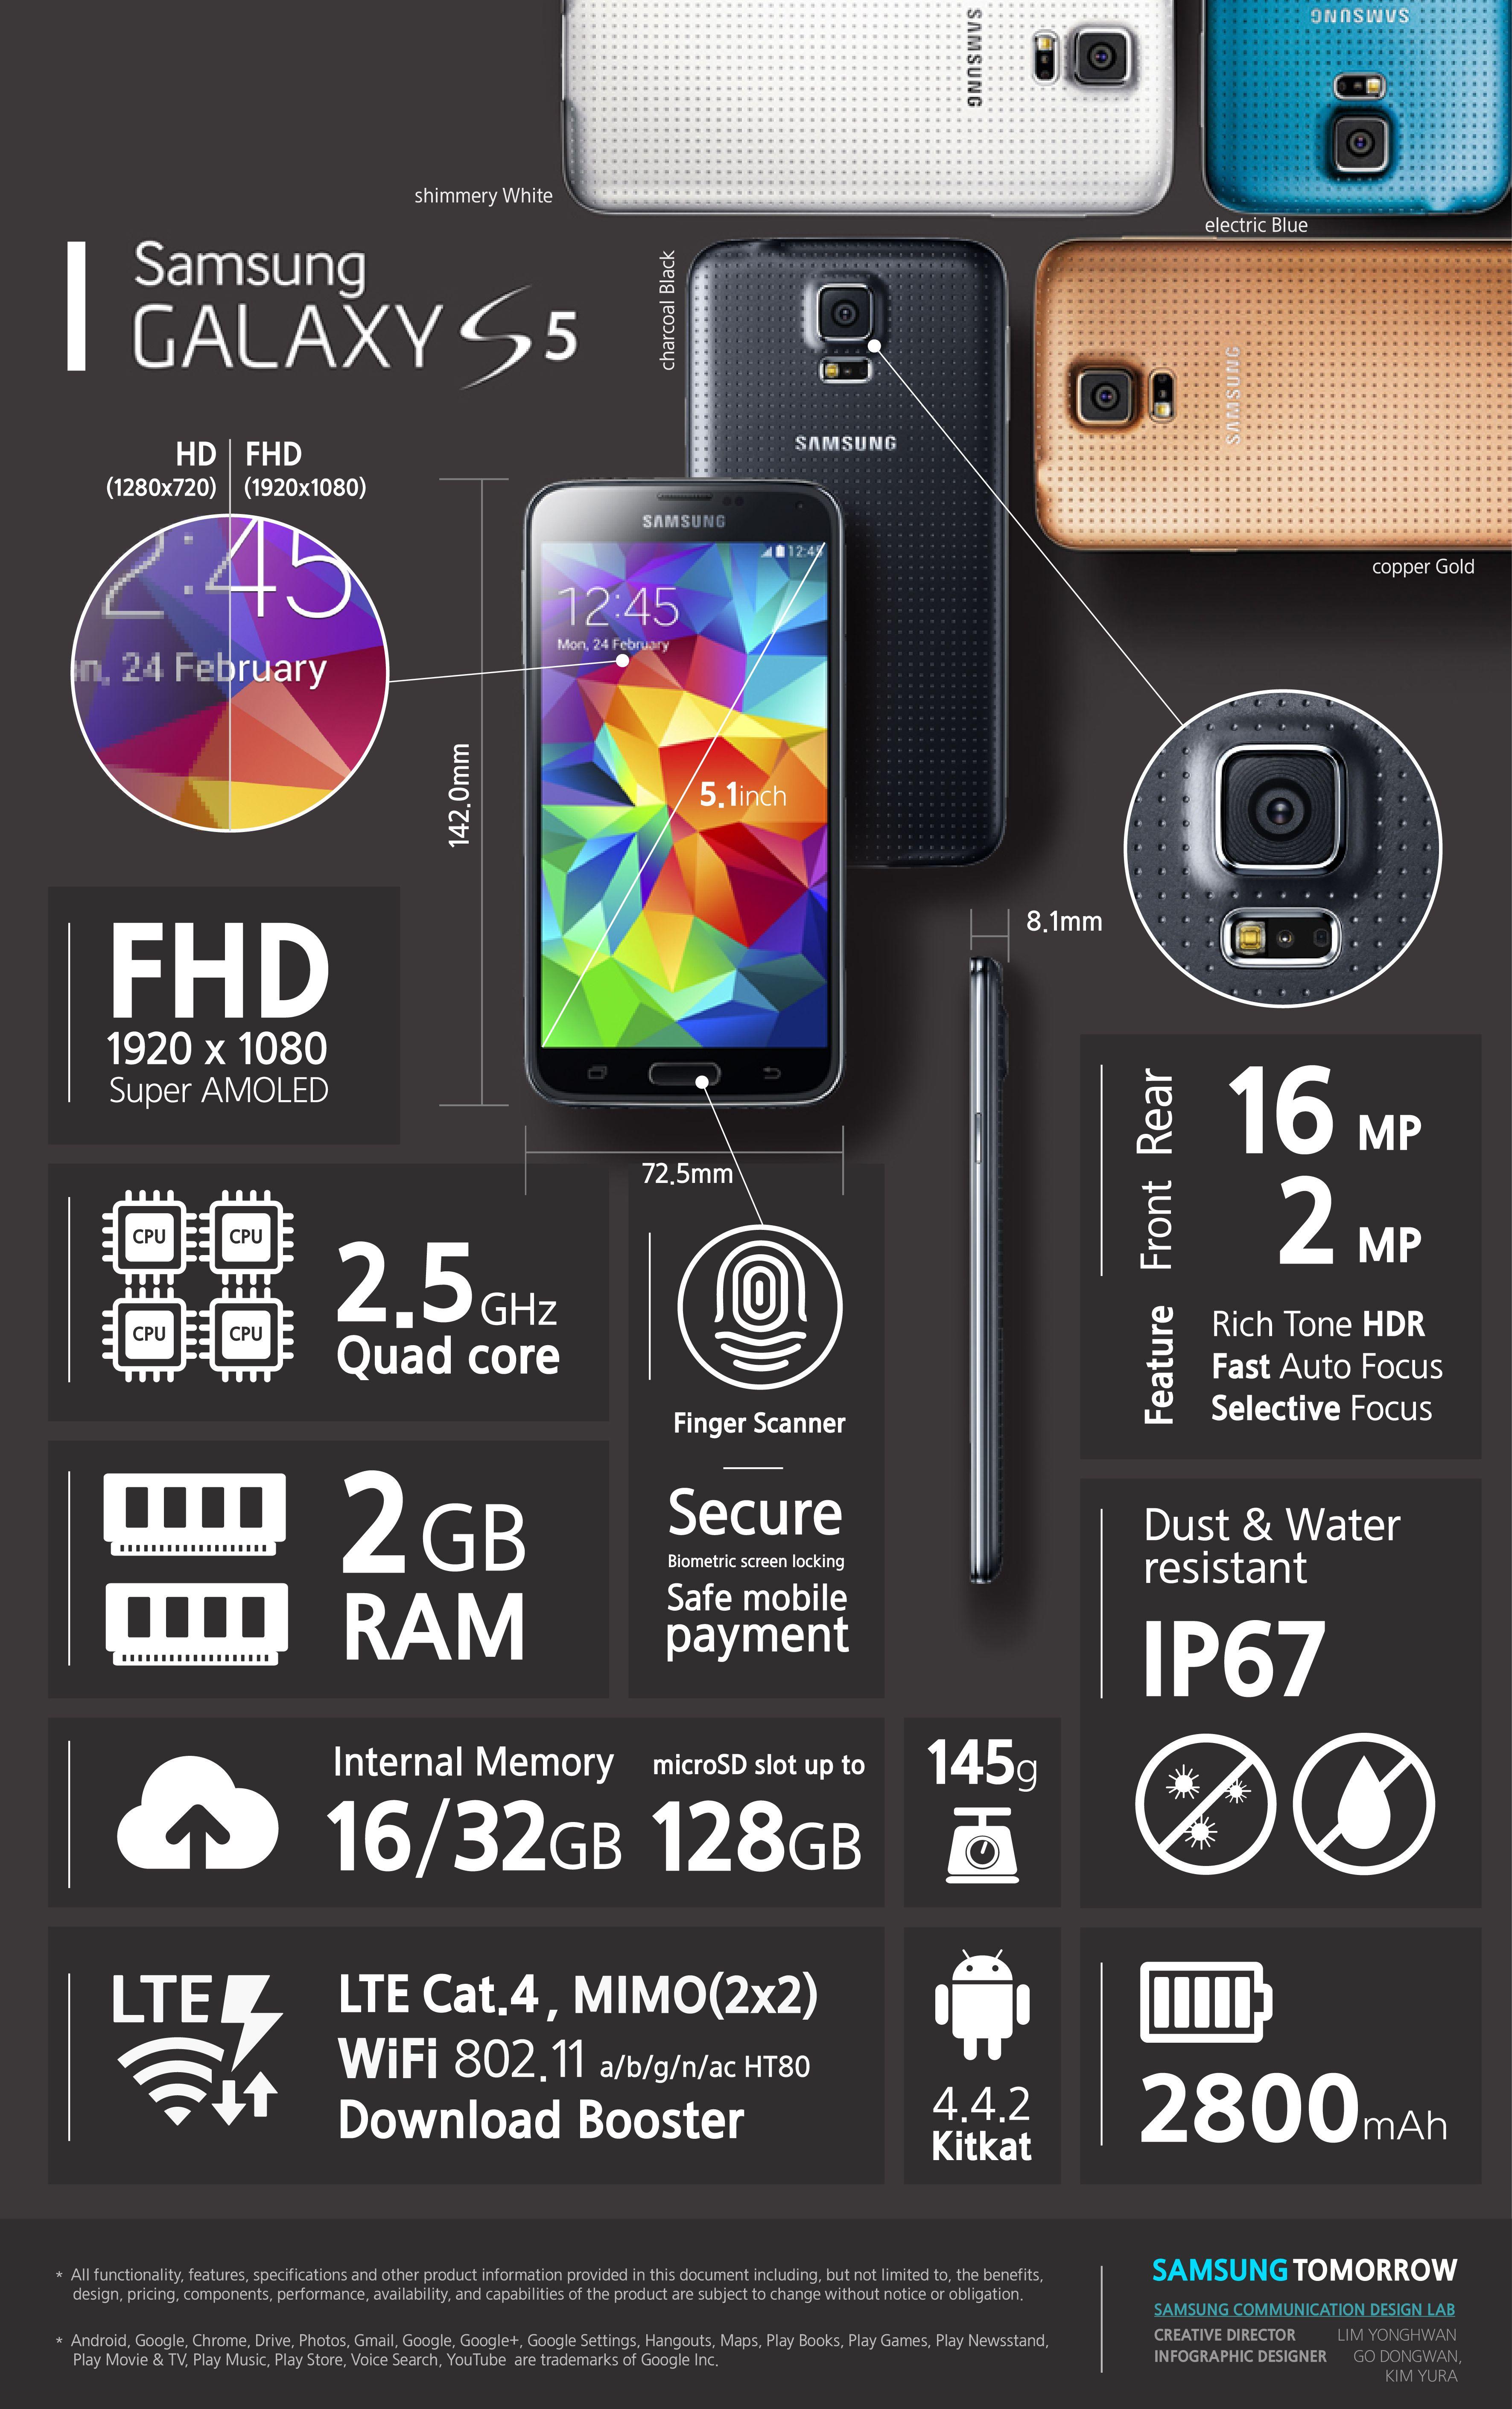 cf82c6402df Pin by Jakub Buszyński on Smartphones specs | Samsung, Samsung ...